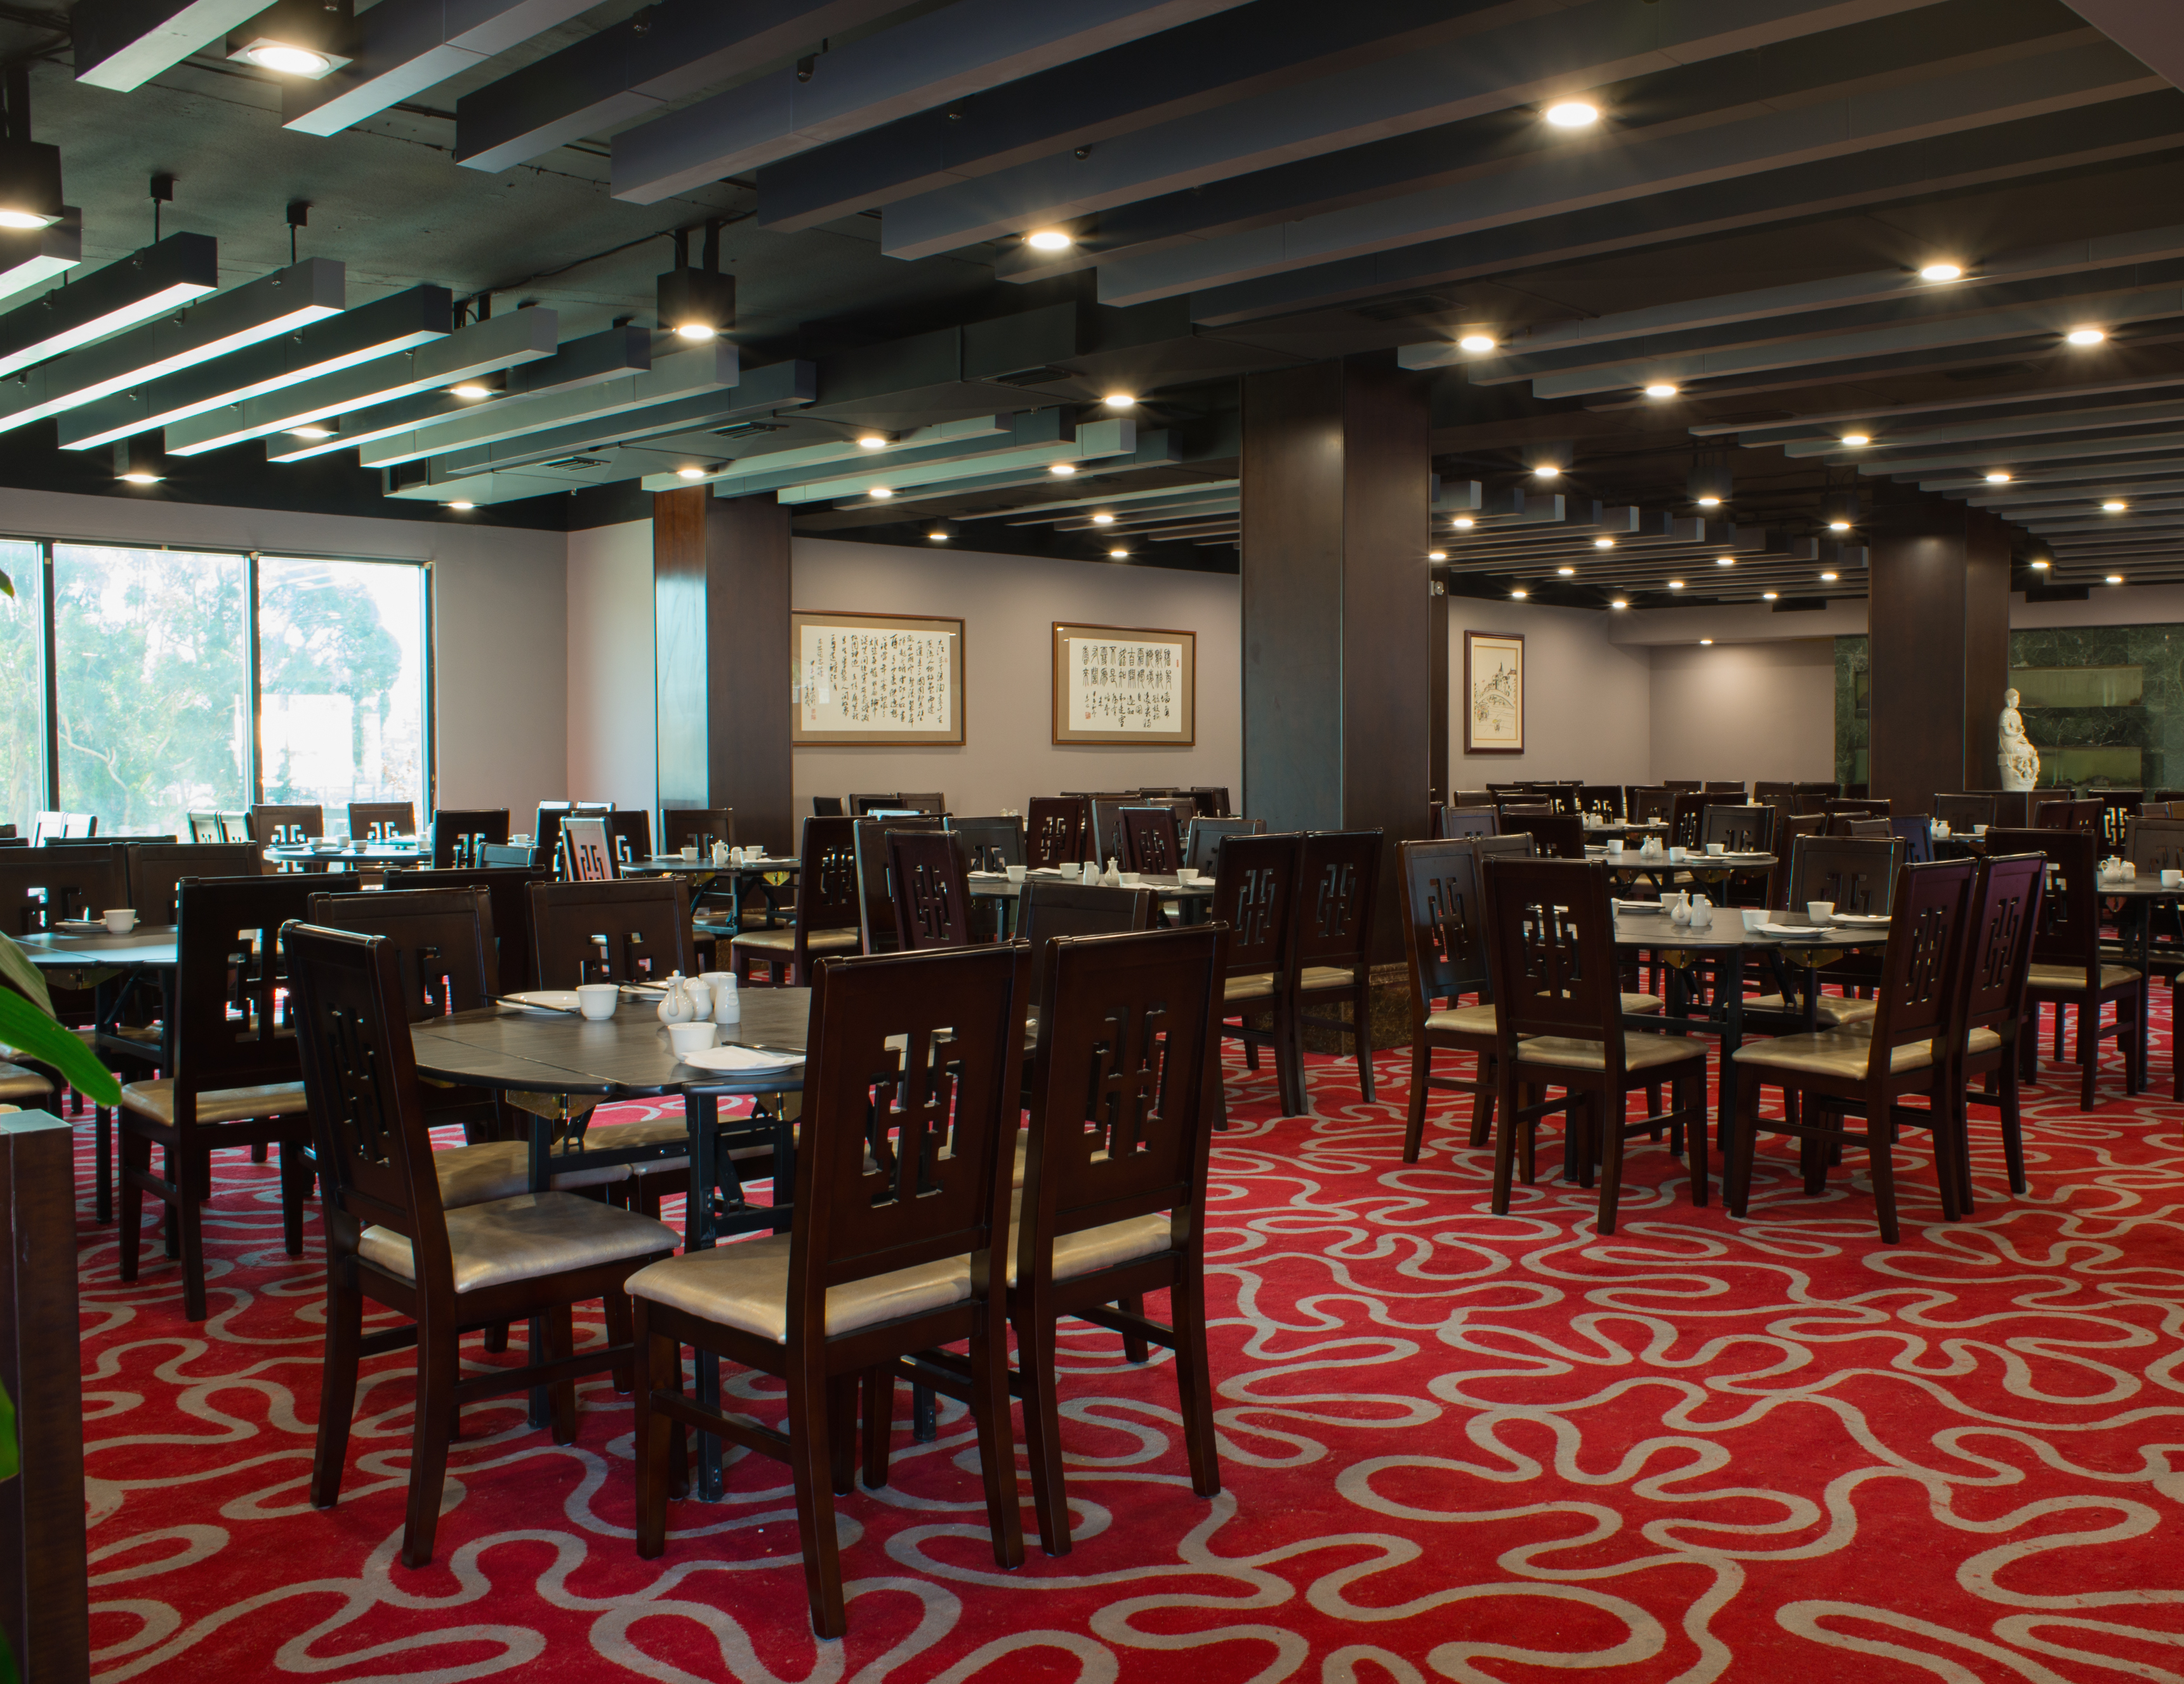 THE 10 BEST Chinese Restaurants in San Diego - TripAdvisor